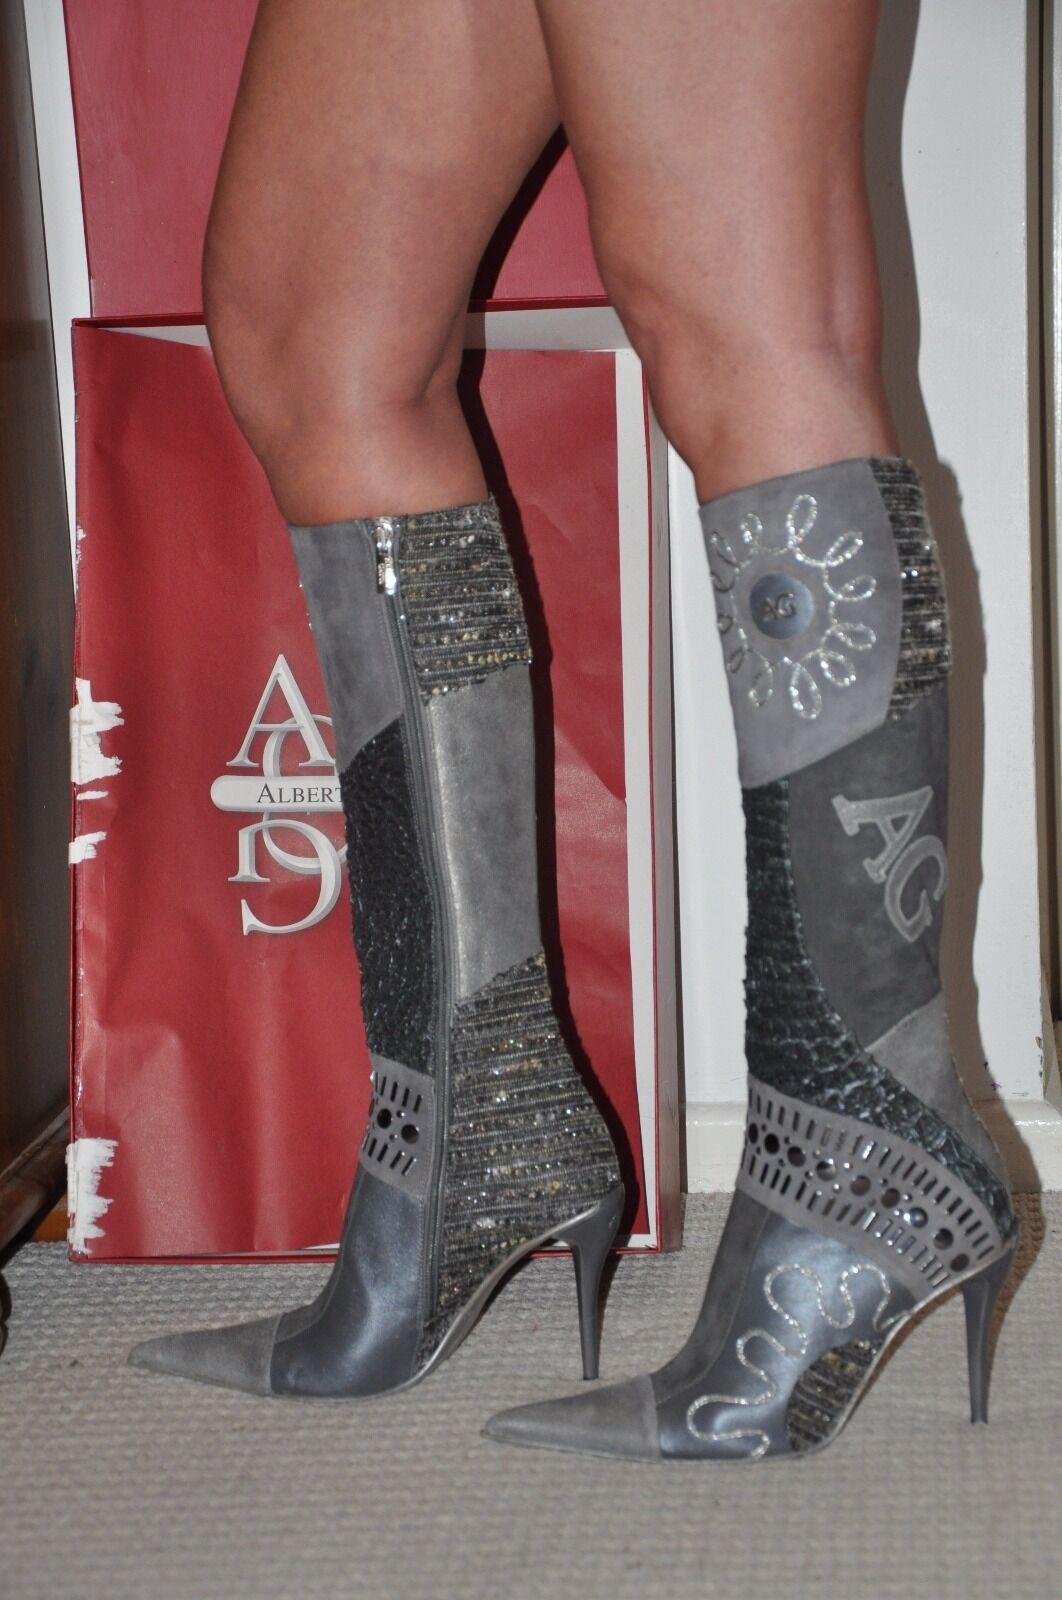 PARTY ALBERTO GATTI REAL LEATHER LONG LONG LONG Stiefel,grau,FarbeFUL COMBINATION,UK4  EU 37 61ceb4